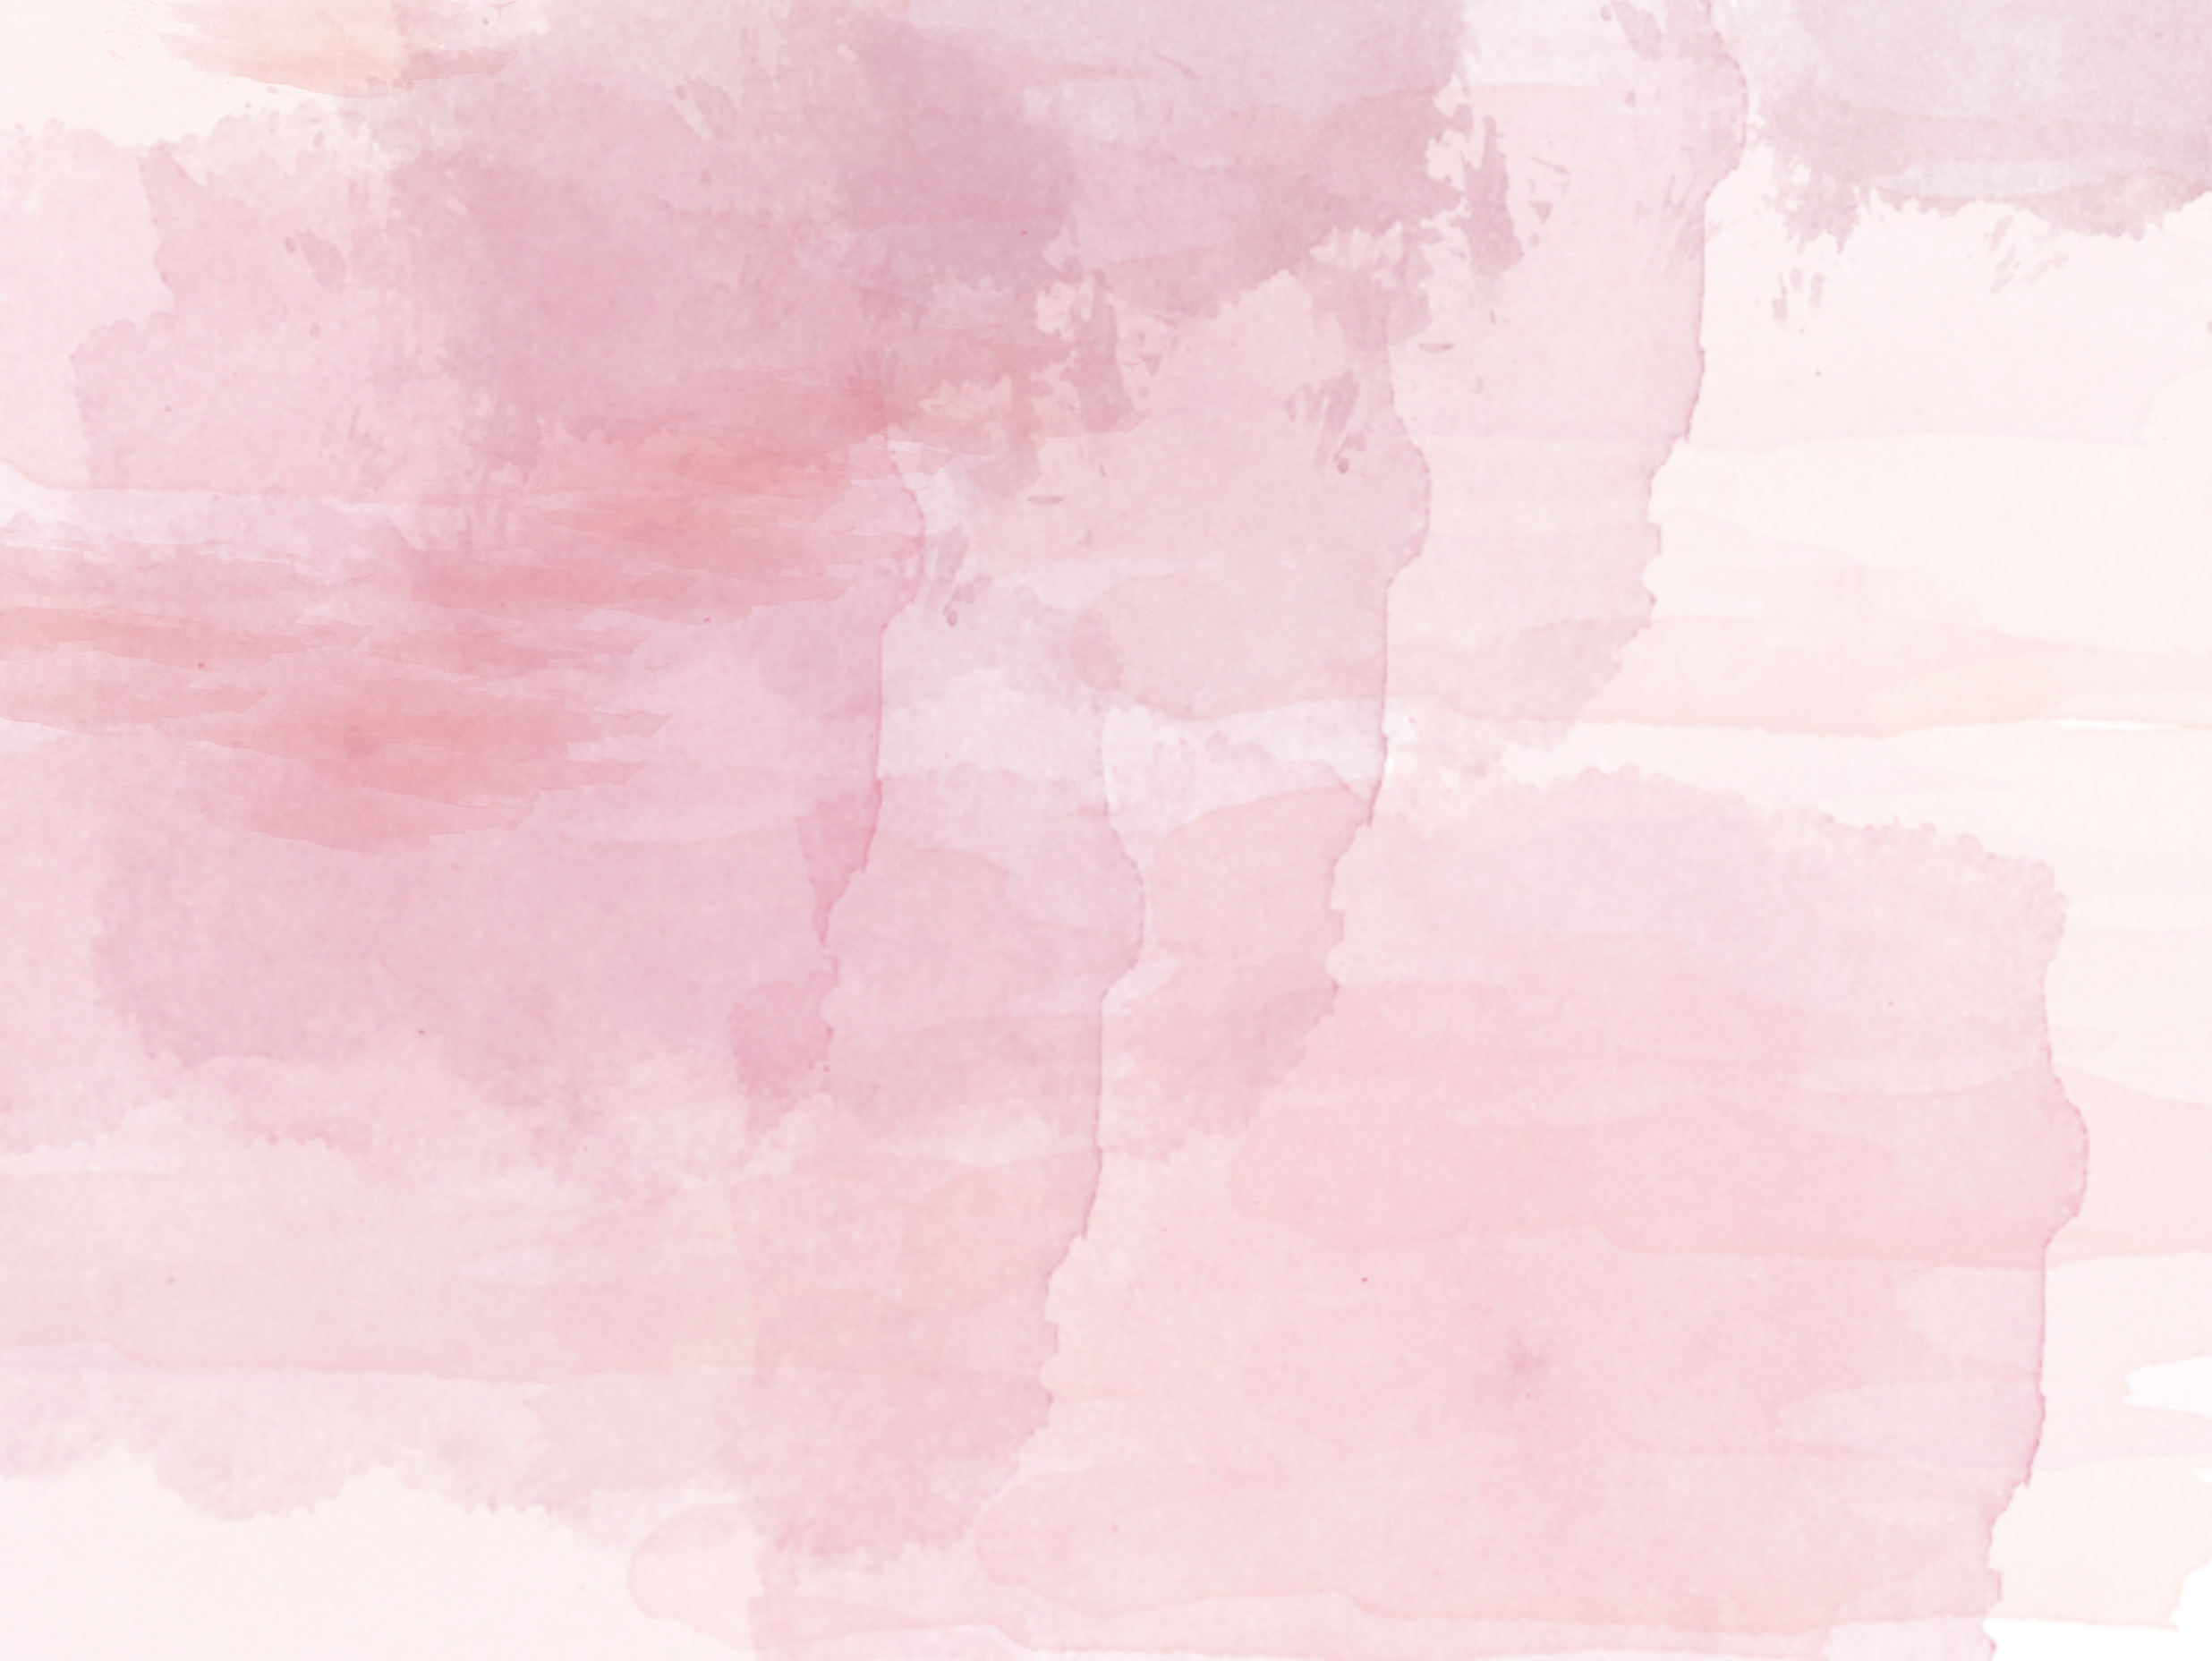 Free wallpaper hello watercolor pixejoo - Watercolour Wallpaper Wallpapersafari